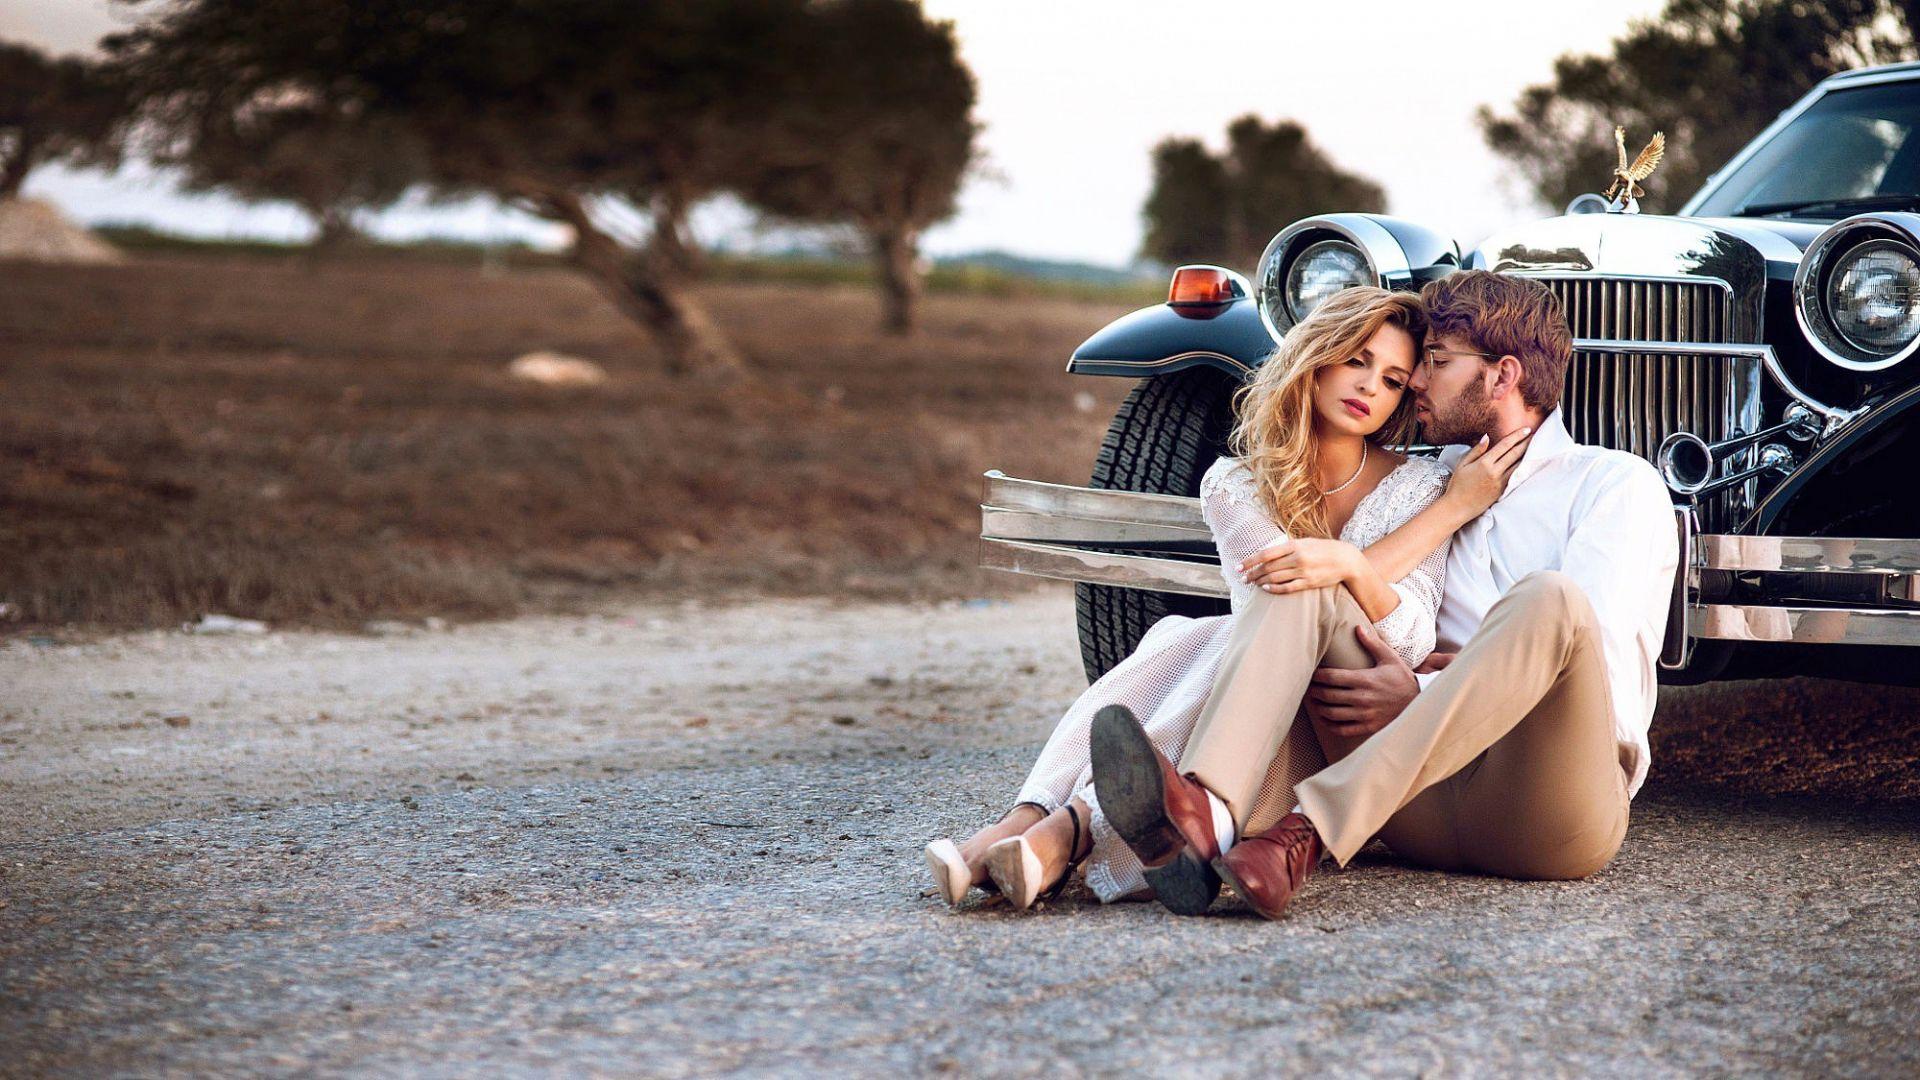 Wallpaper Couple, romance, love, car, outdoor